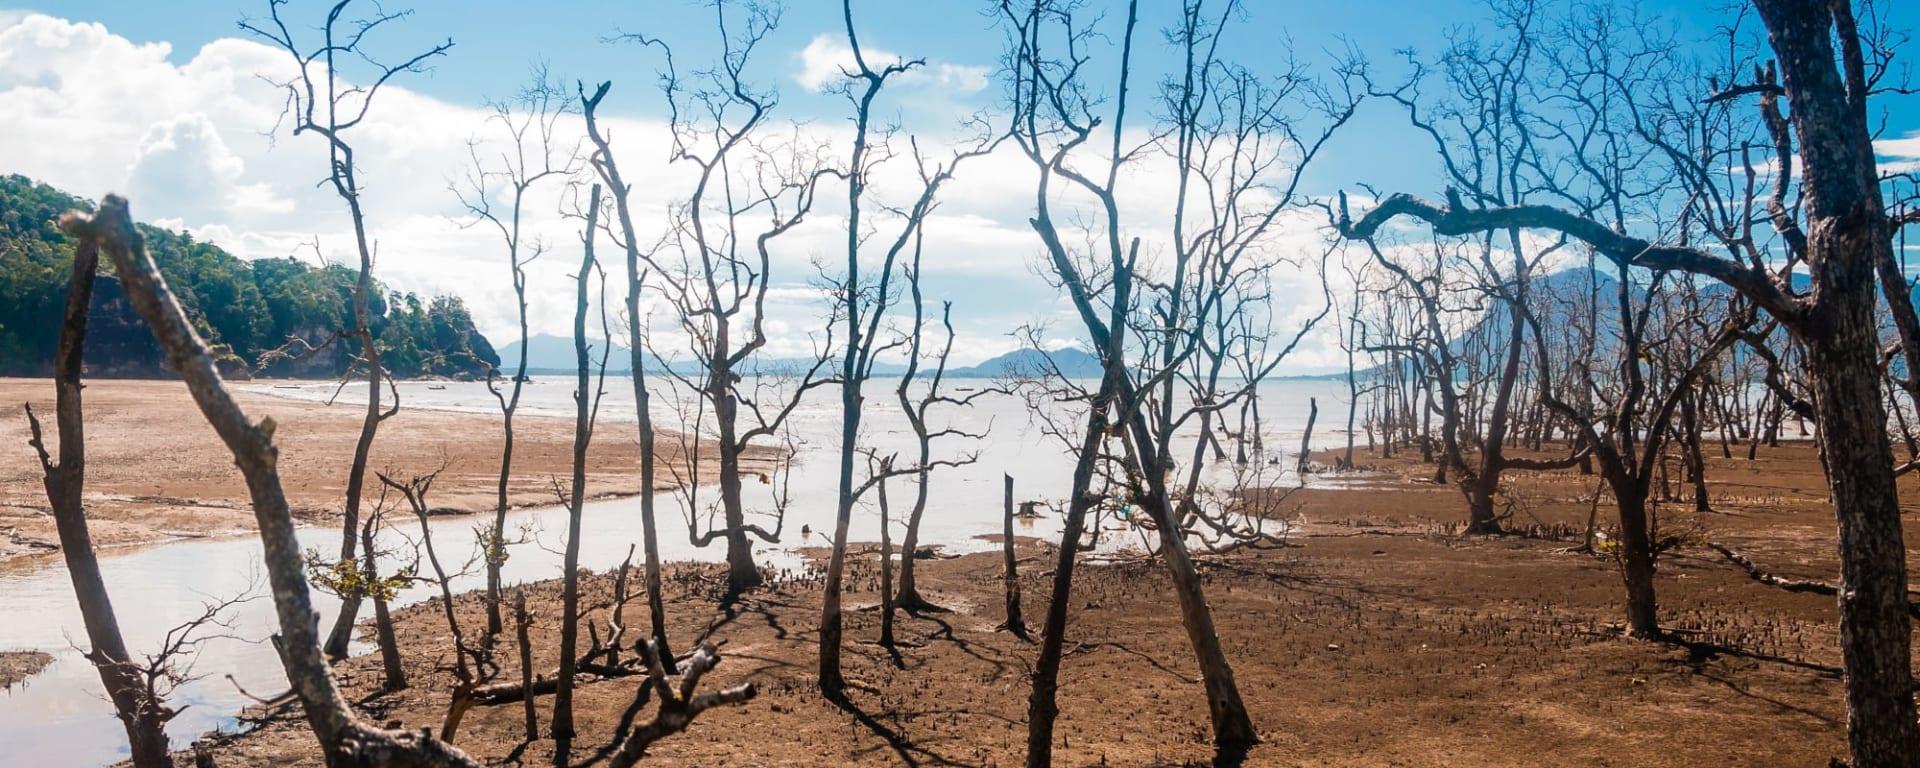 Bako Nationalpark, EN, Ganztägig in Kuching: Borneo Sarawak Bako Nationalpark